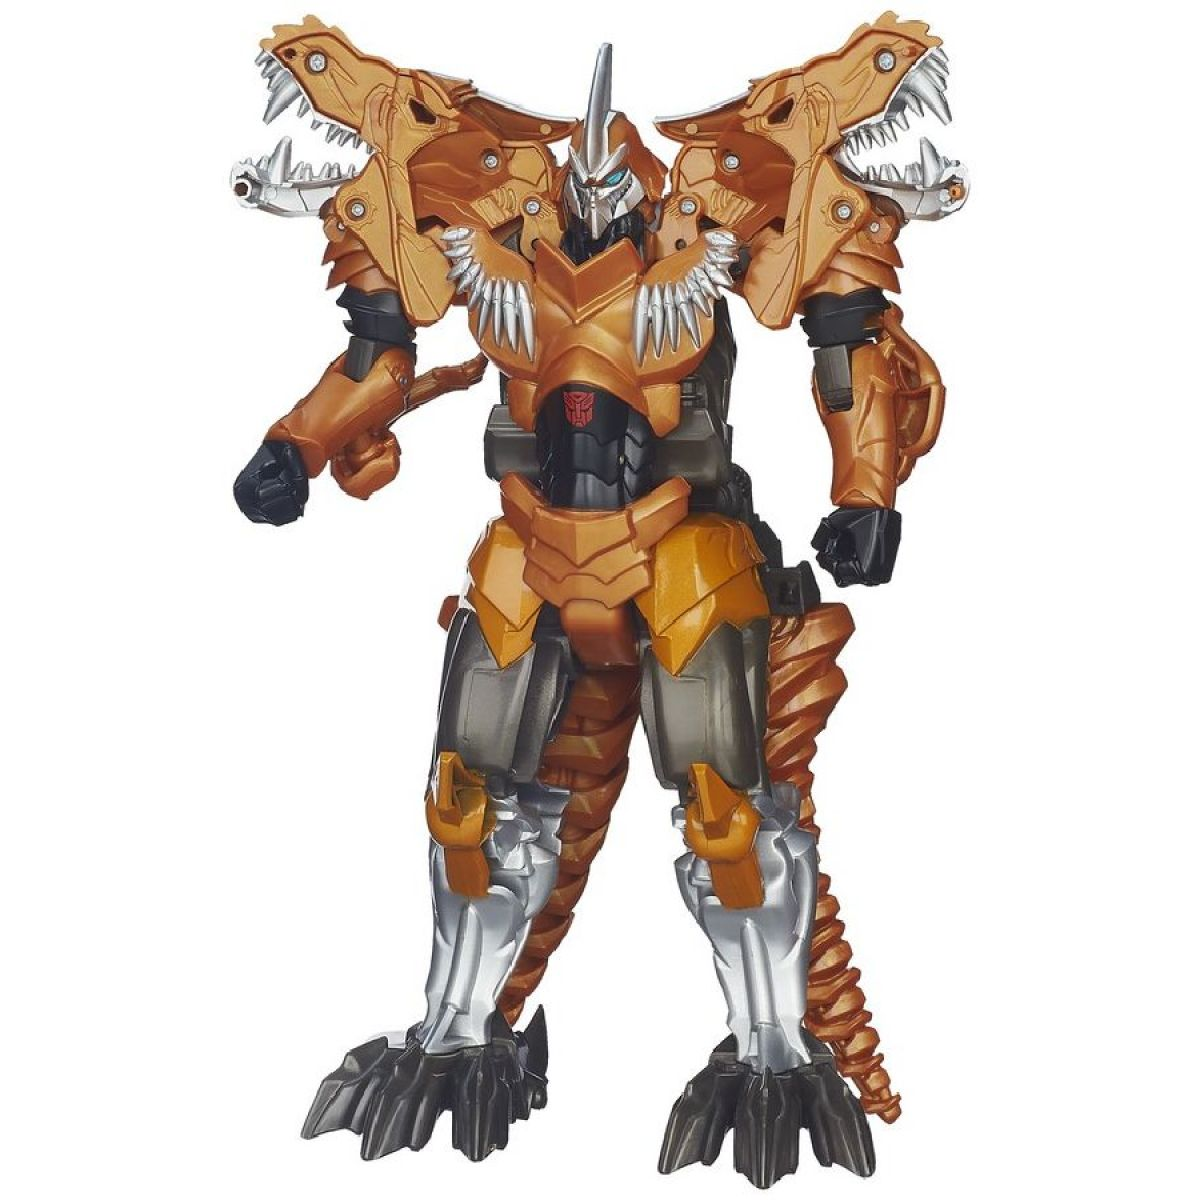 Transformers 4 Grimlock transformace otočením